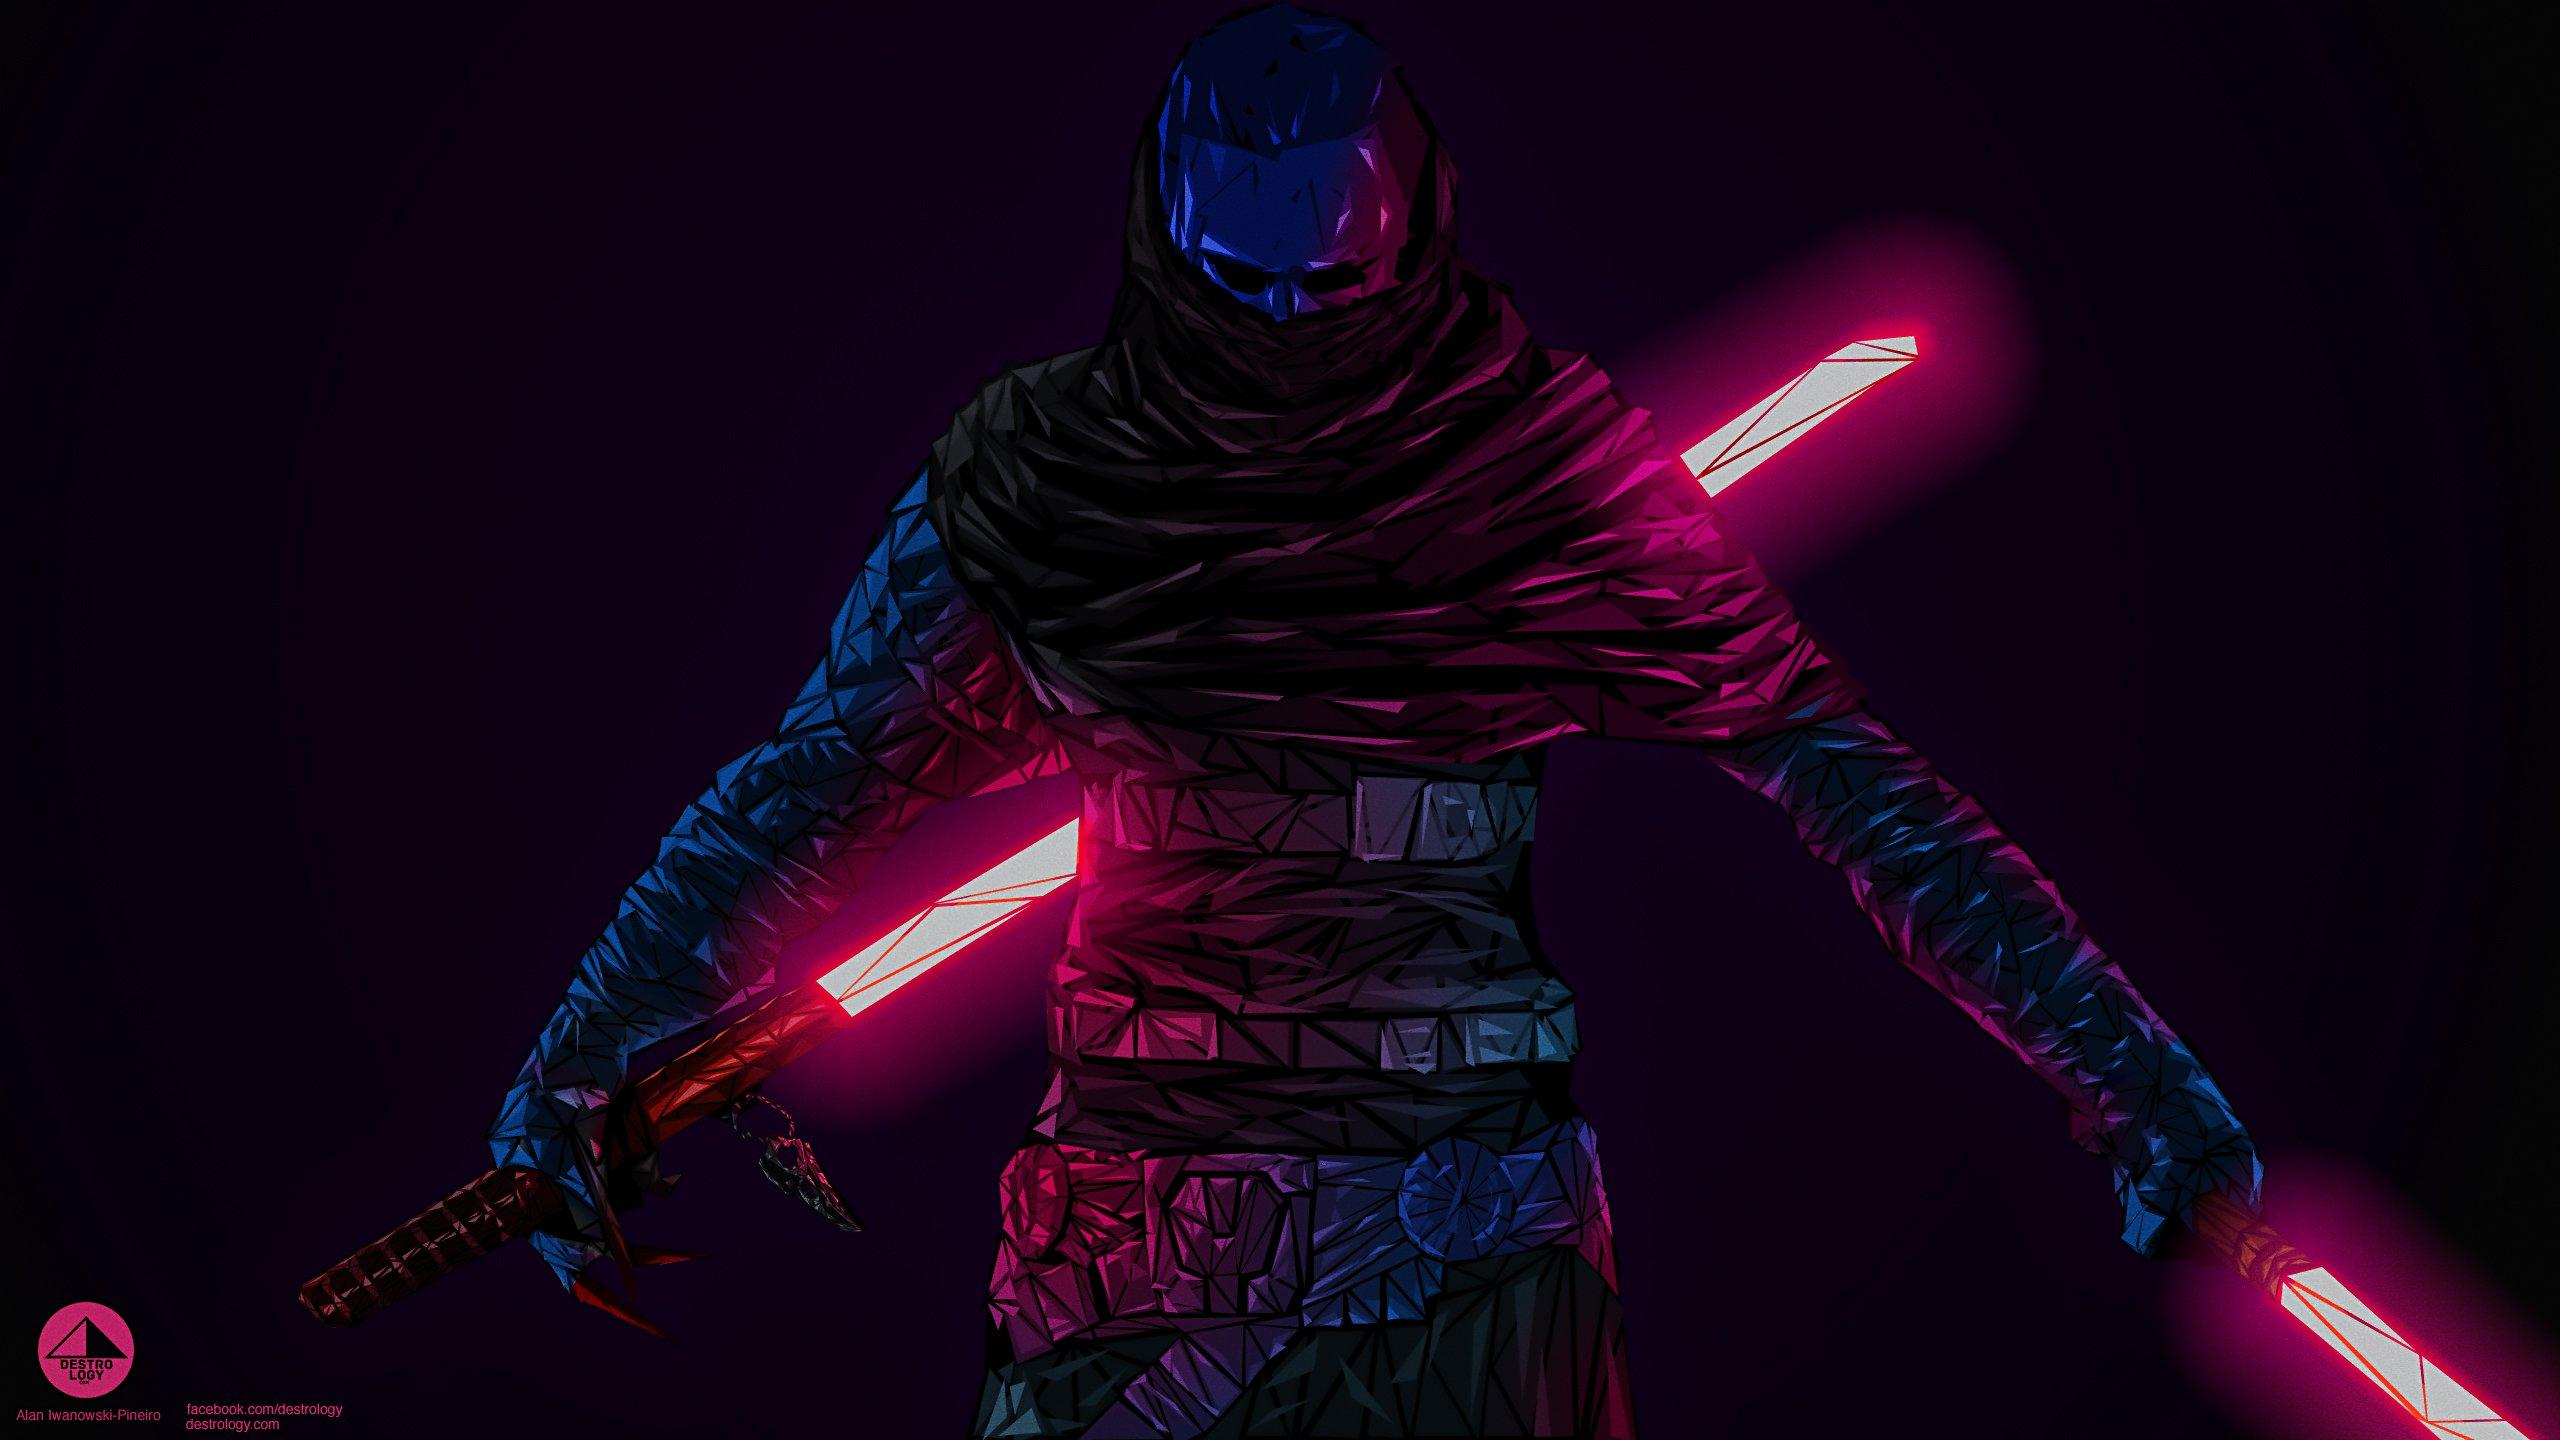 Fondos de pantalla Star Wars Fanart Illustración